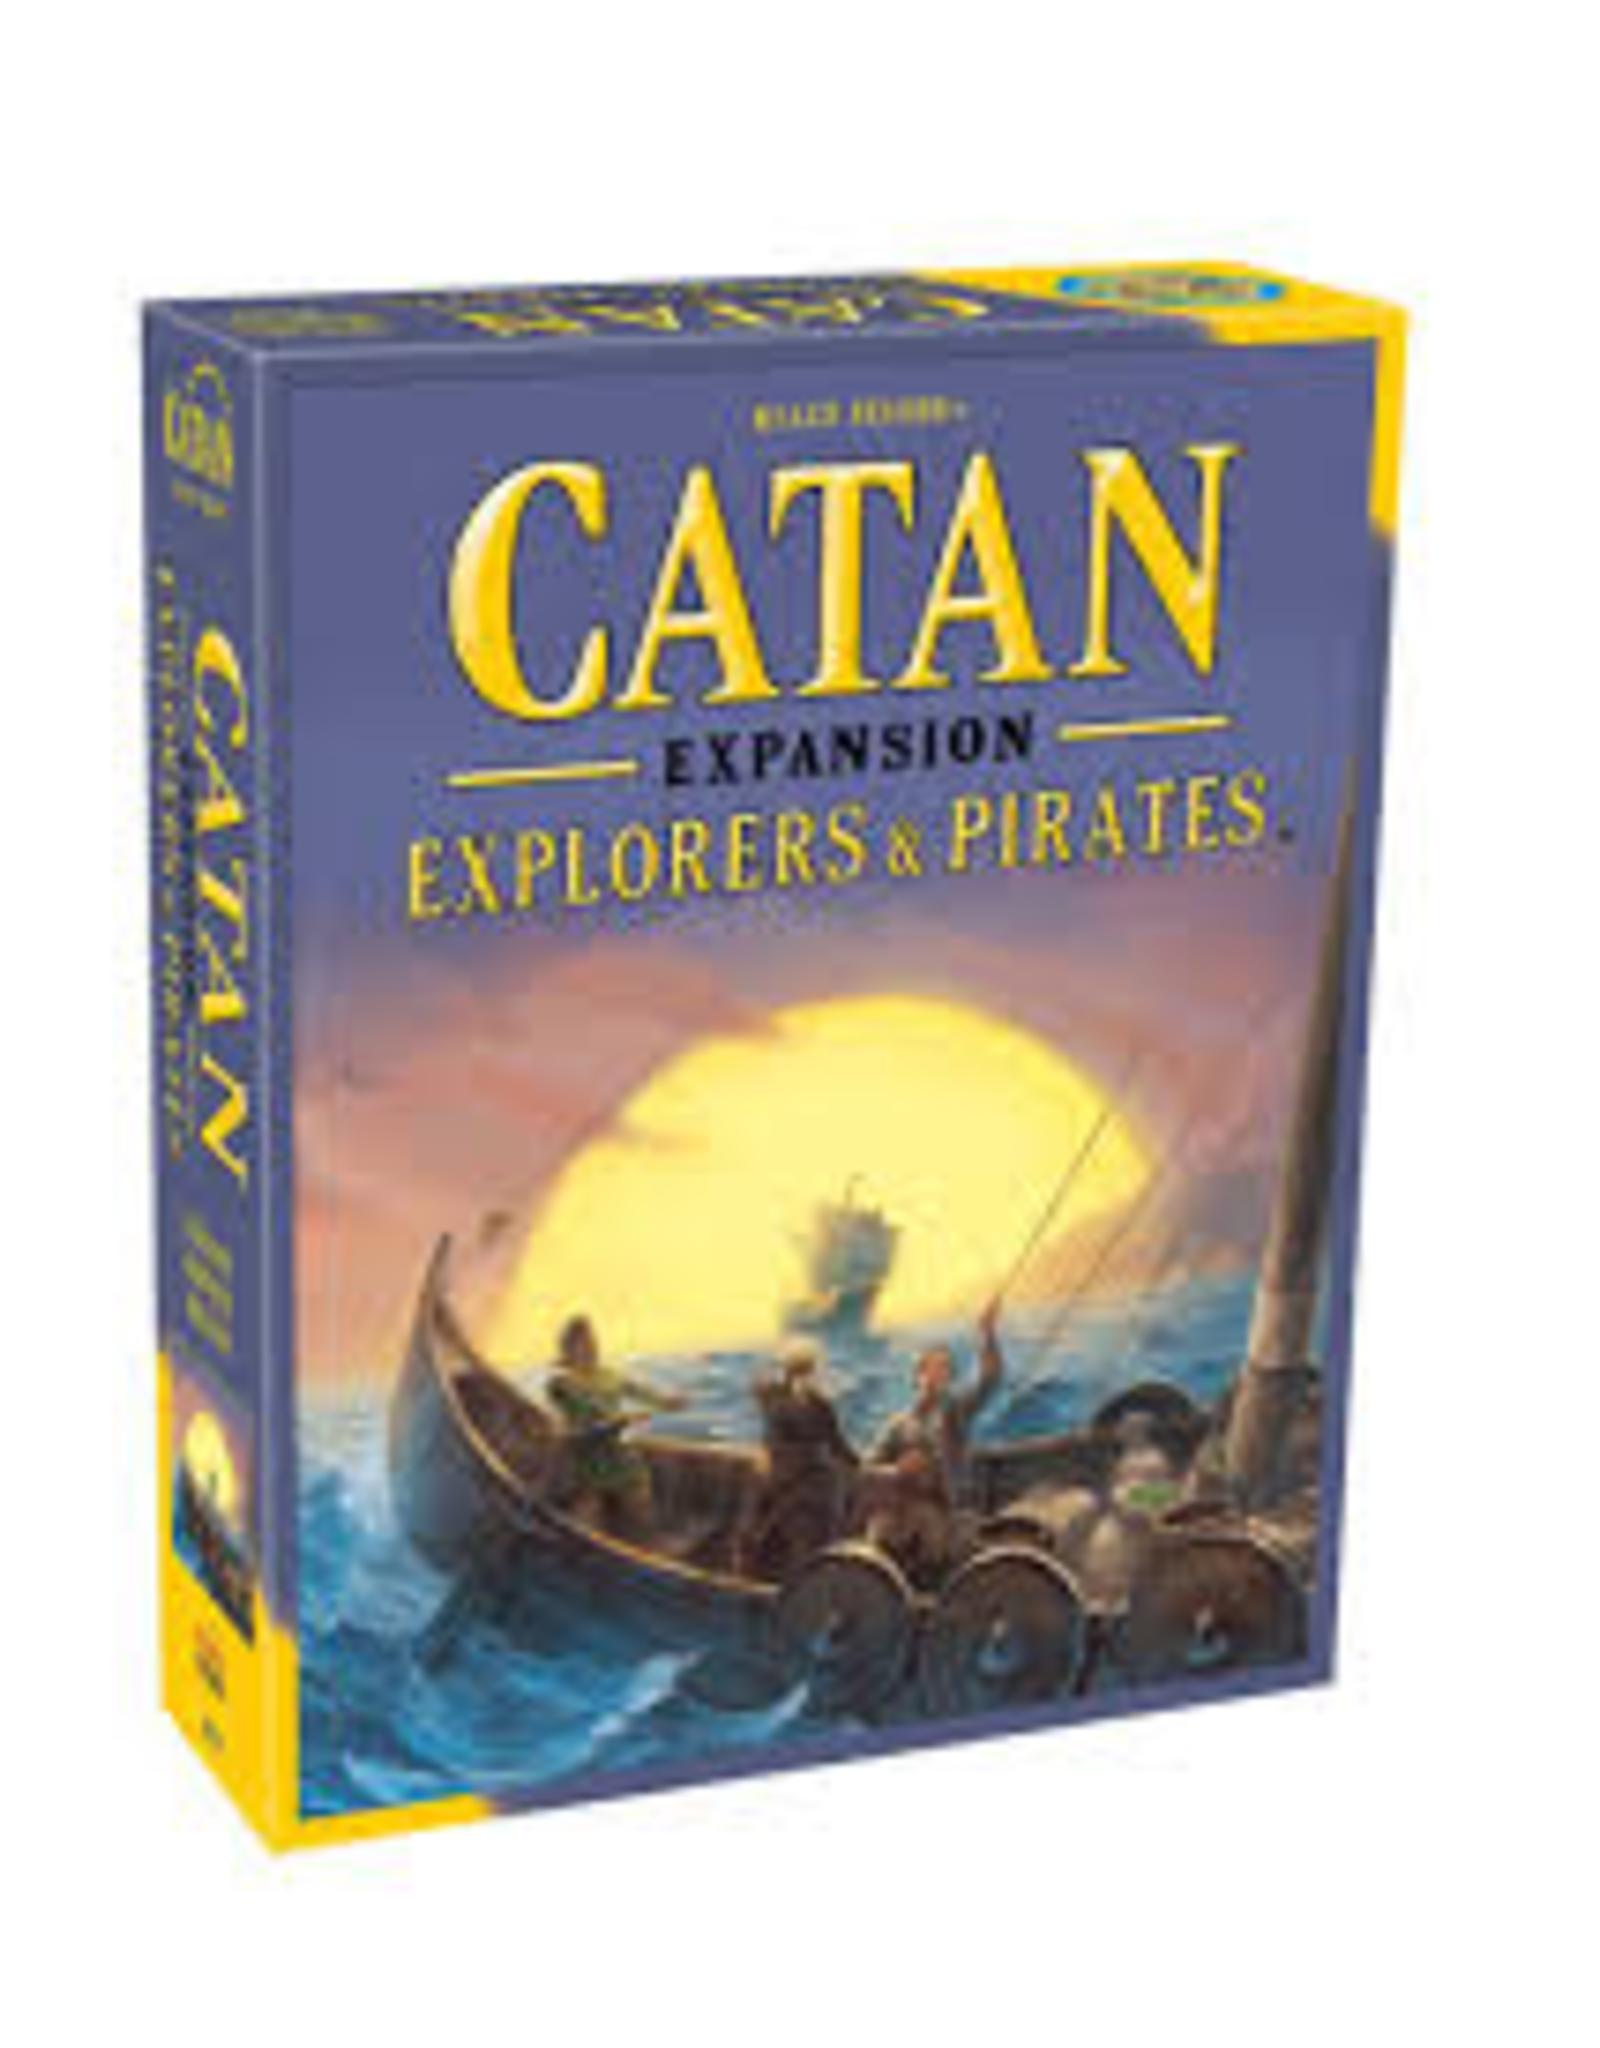 Catan Expansion: Explorers & Pirates - asmodee